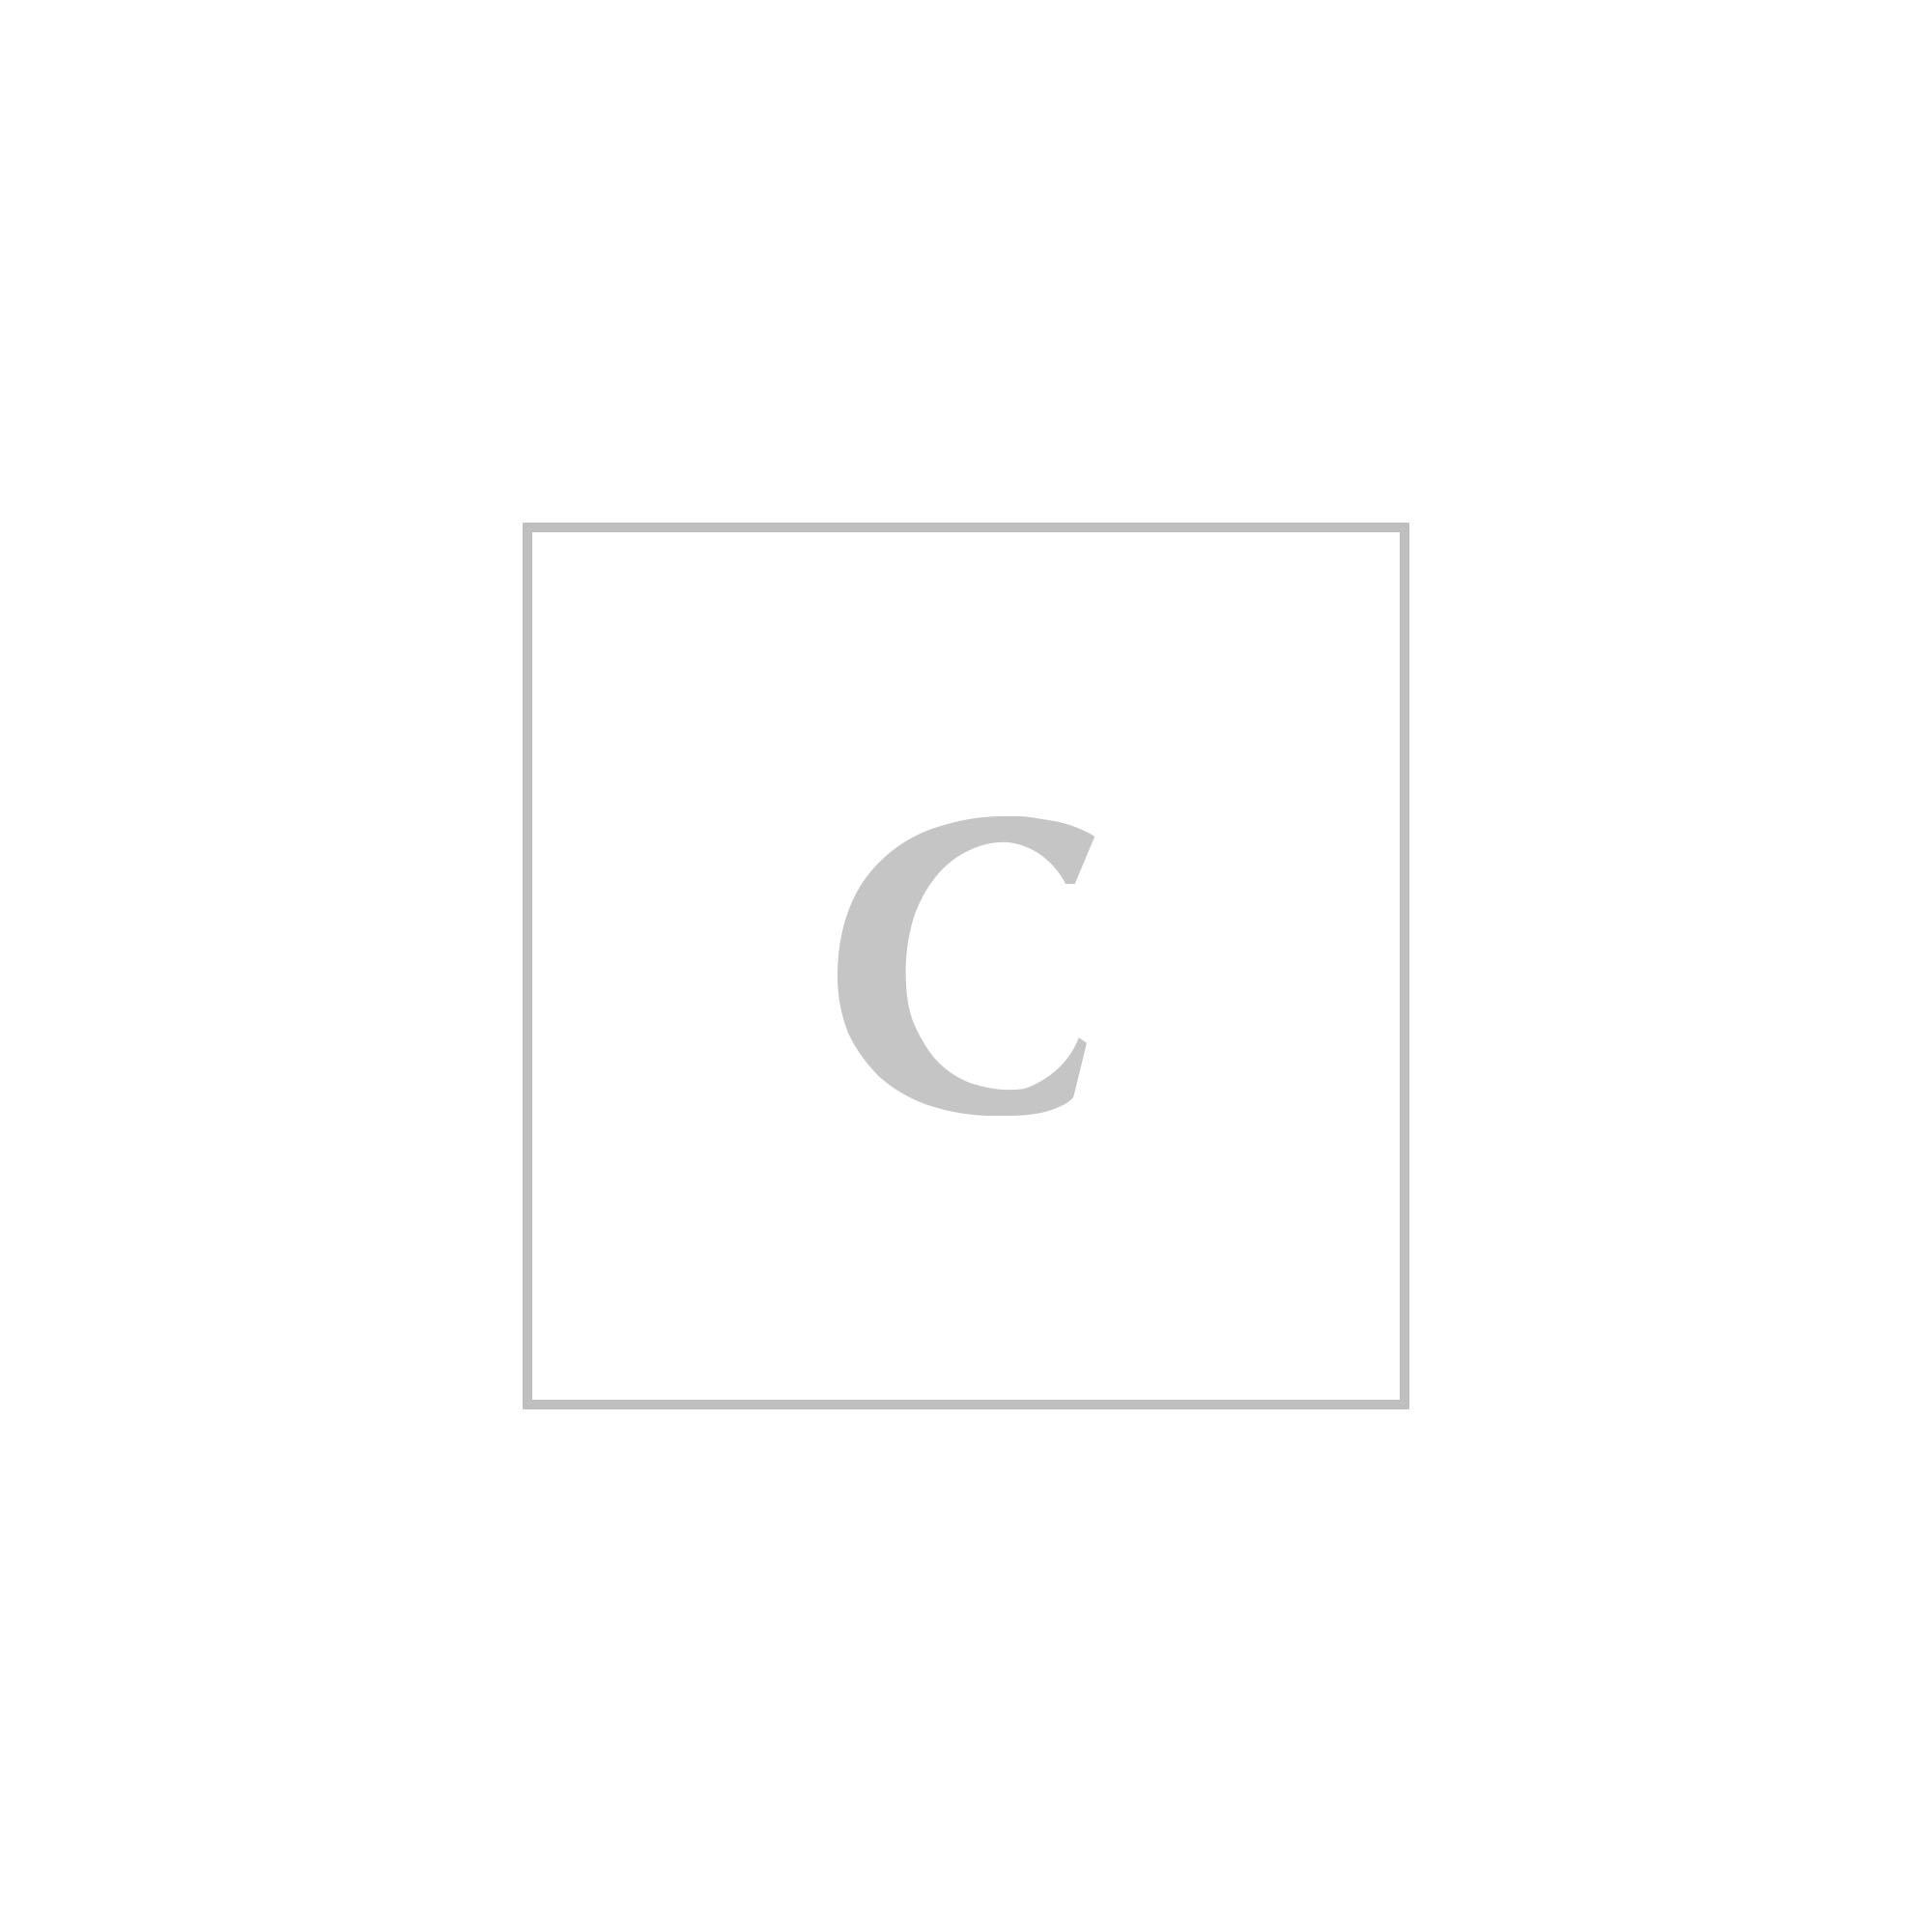 Saint laurent borsa tracolla monogram